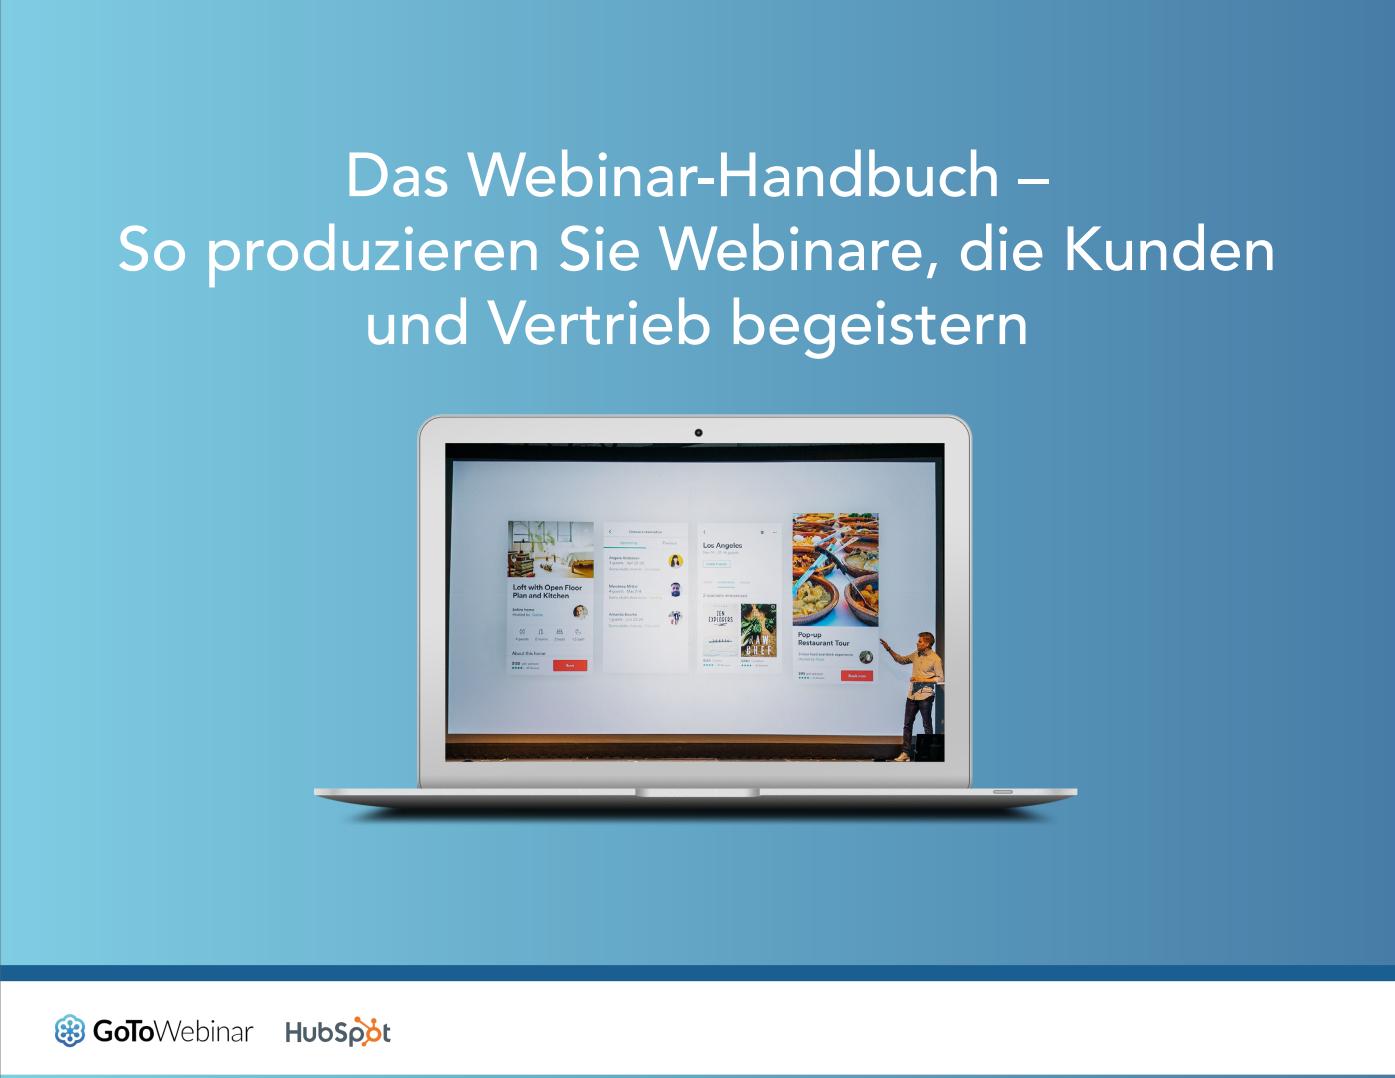 Das Webinar-Handbuch – GoToWebinar & HubSpot – Vorschaubild 1